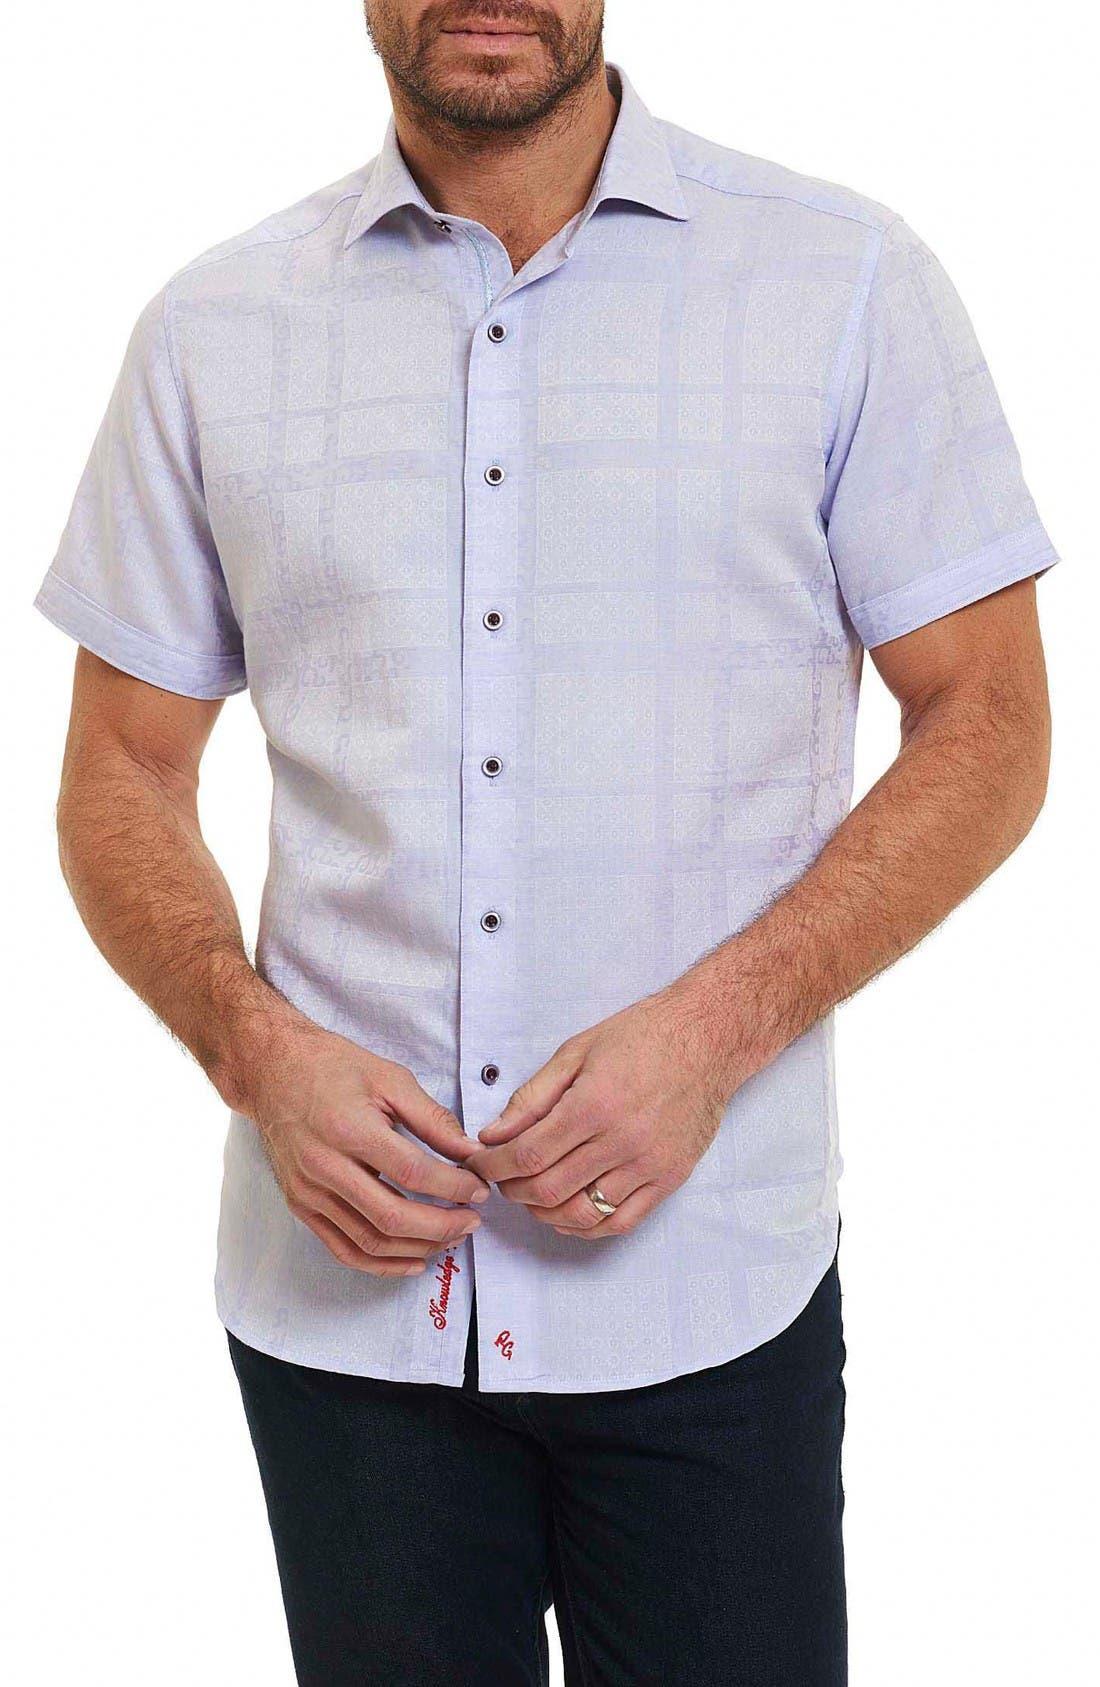 Main Image - Robert Graham Morley Sport Shirt